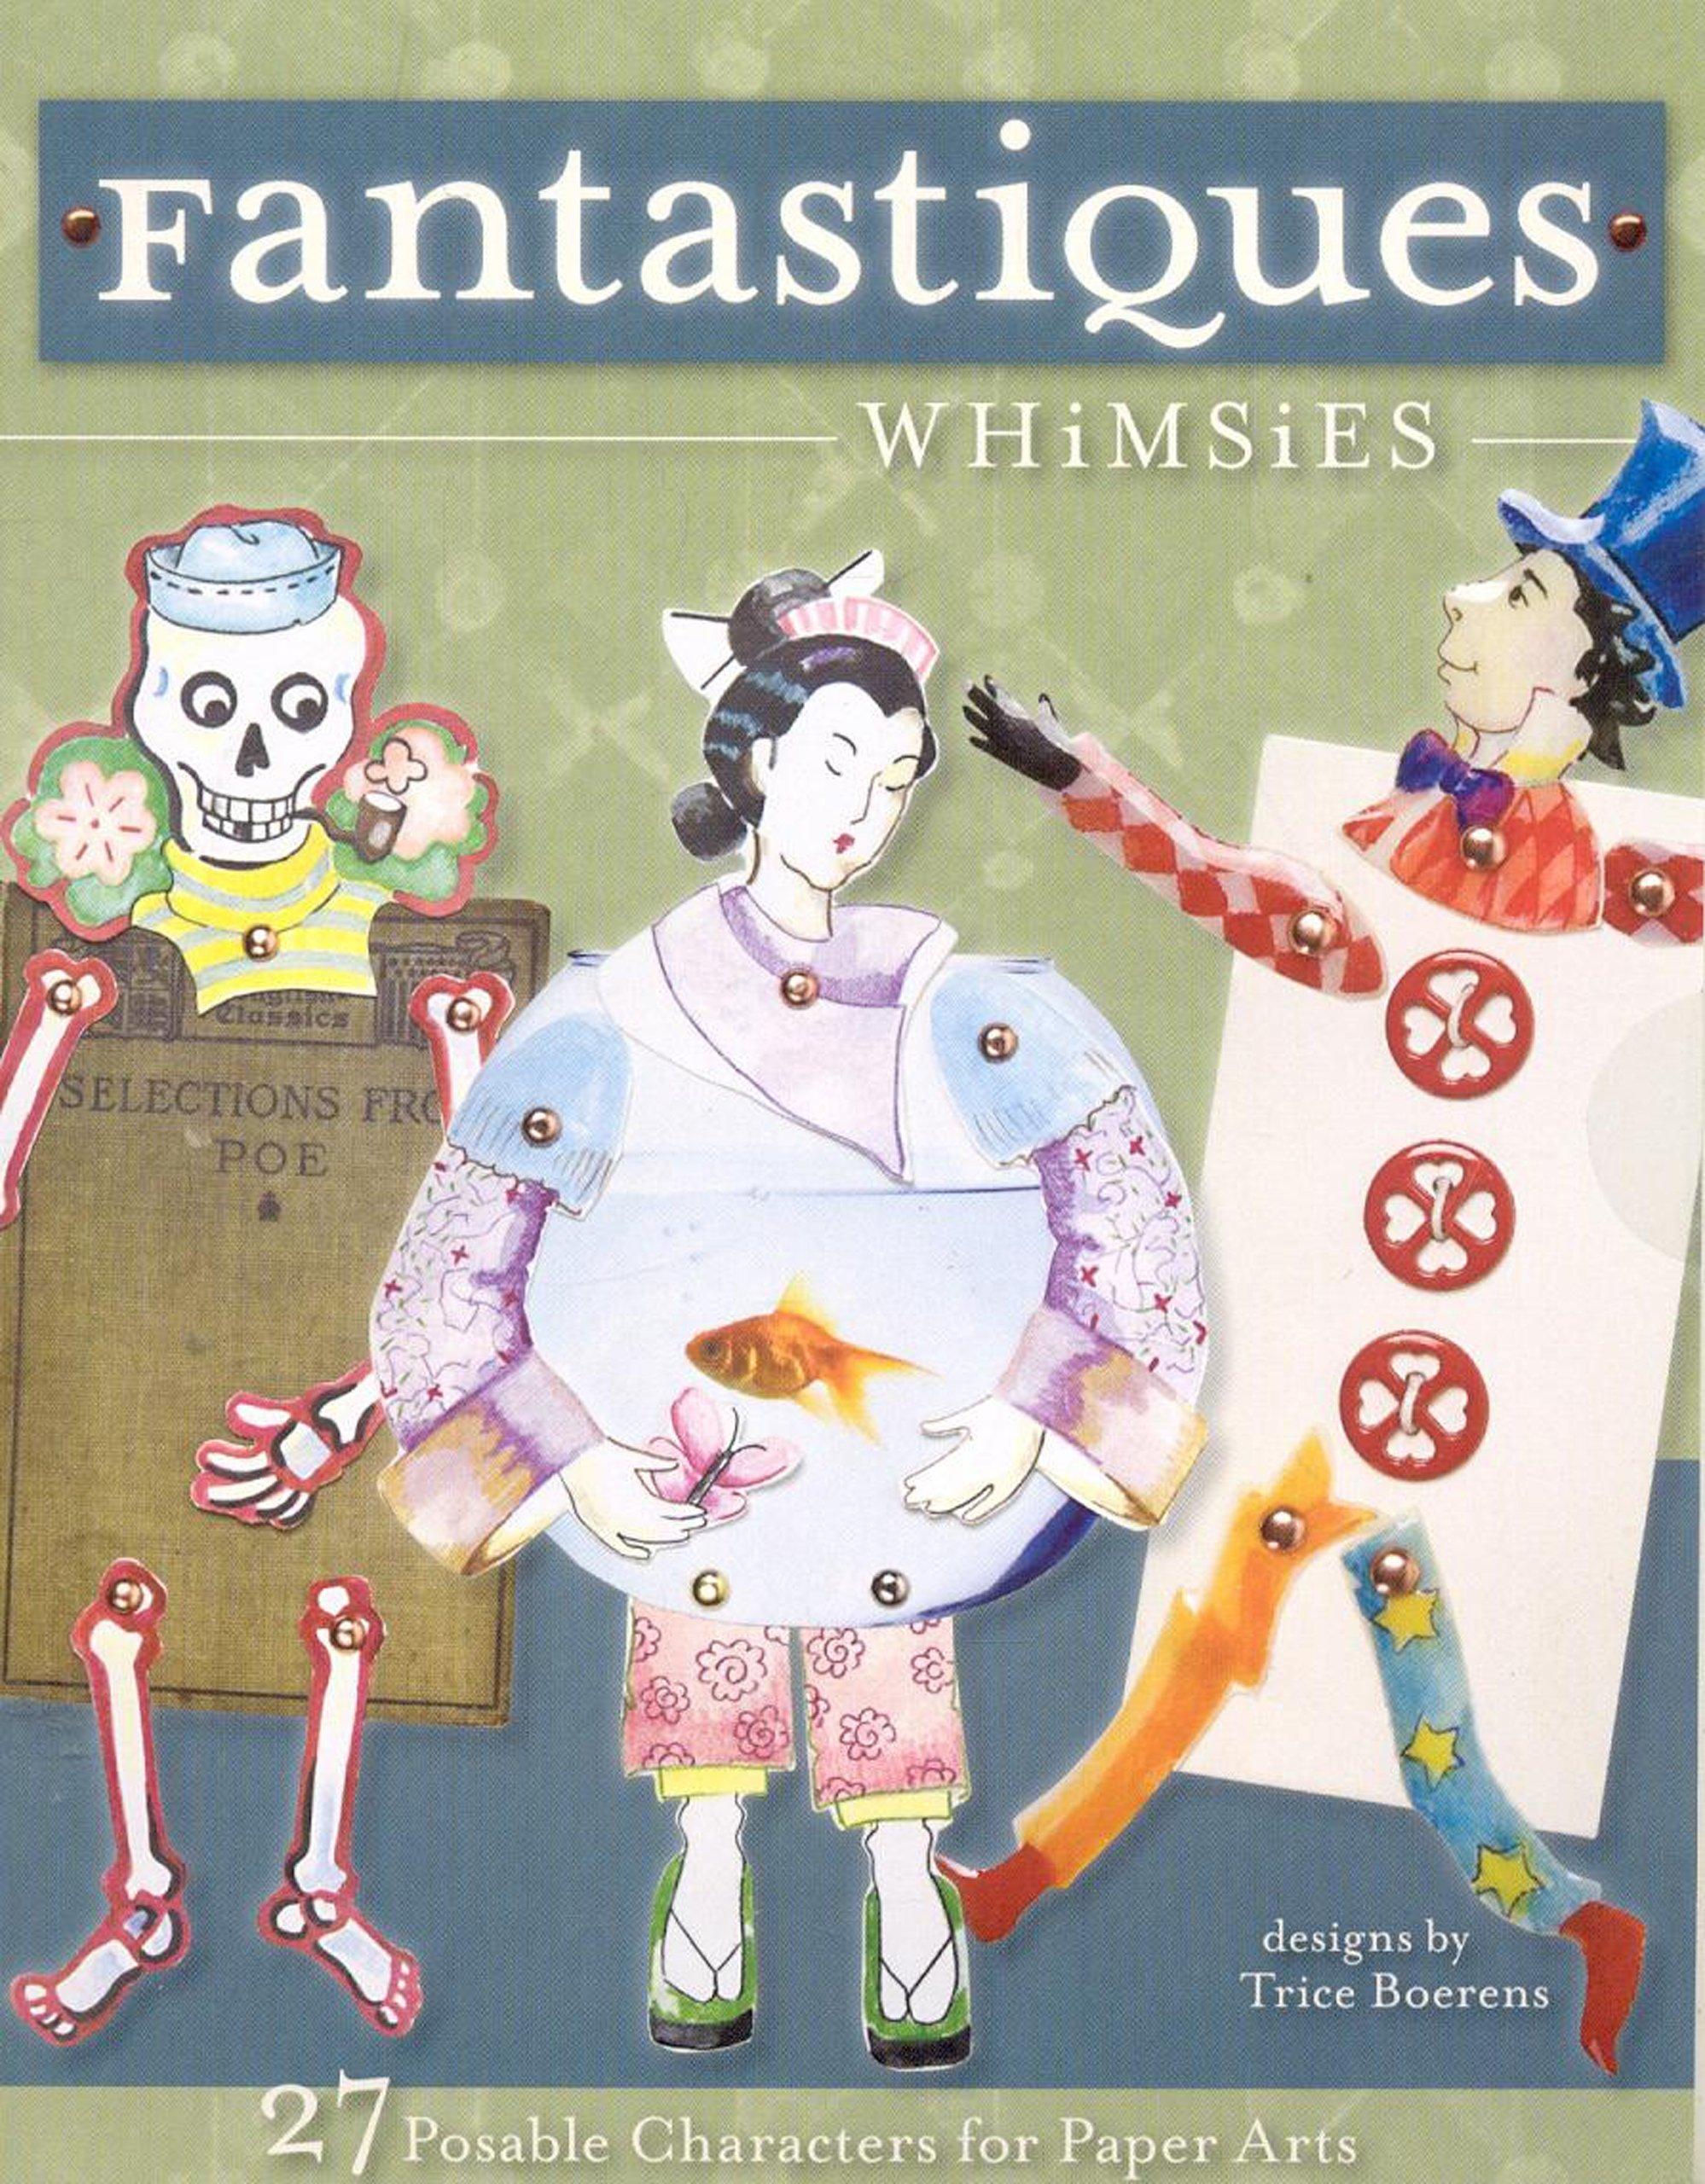 Download Fantastiques: Whimsies ePub fb2 ebook